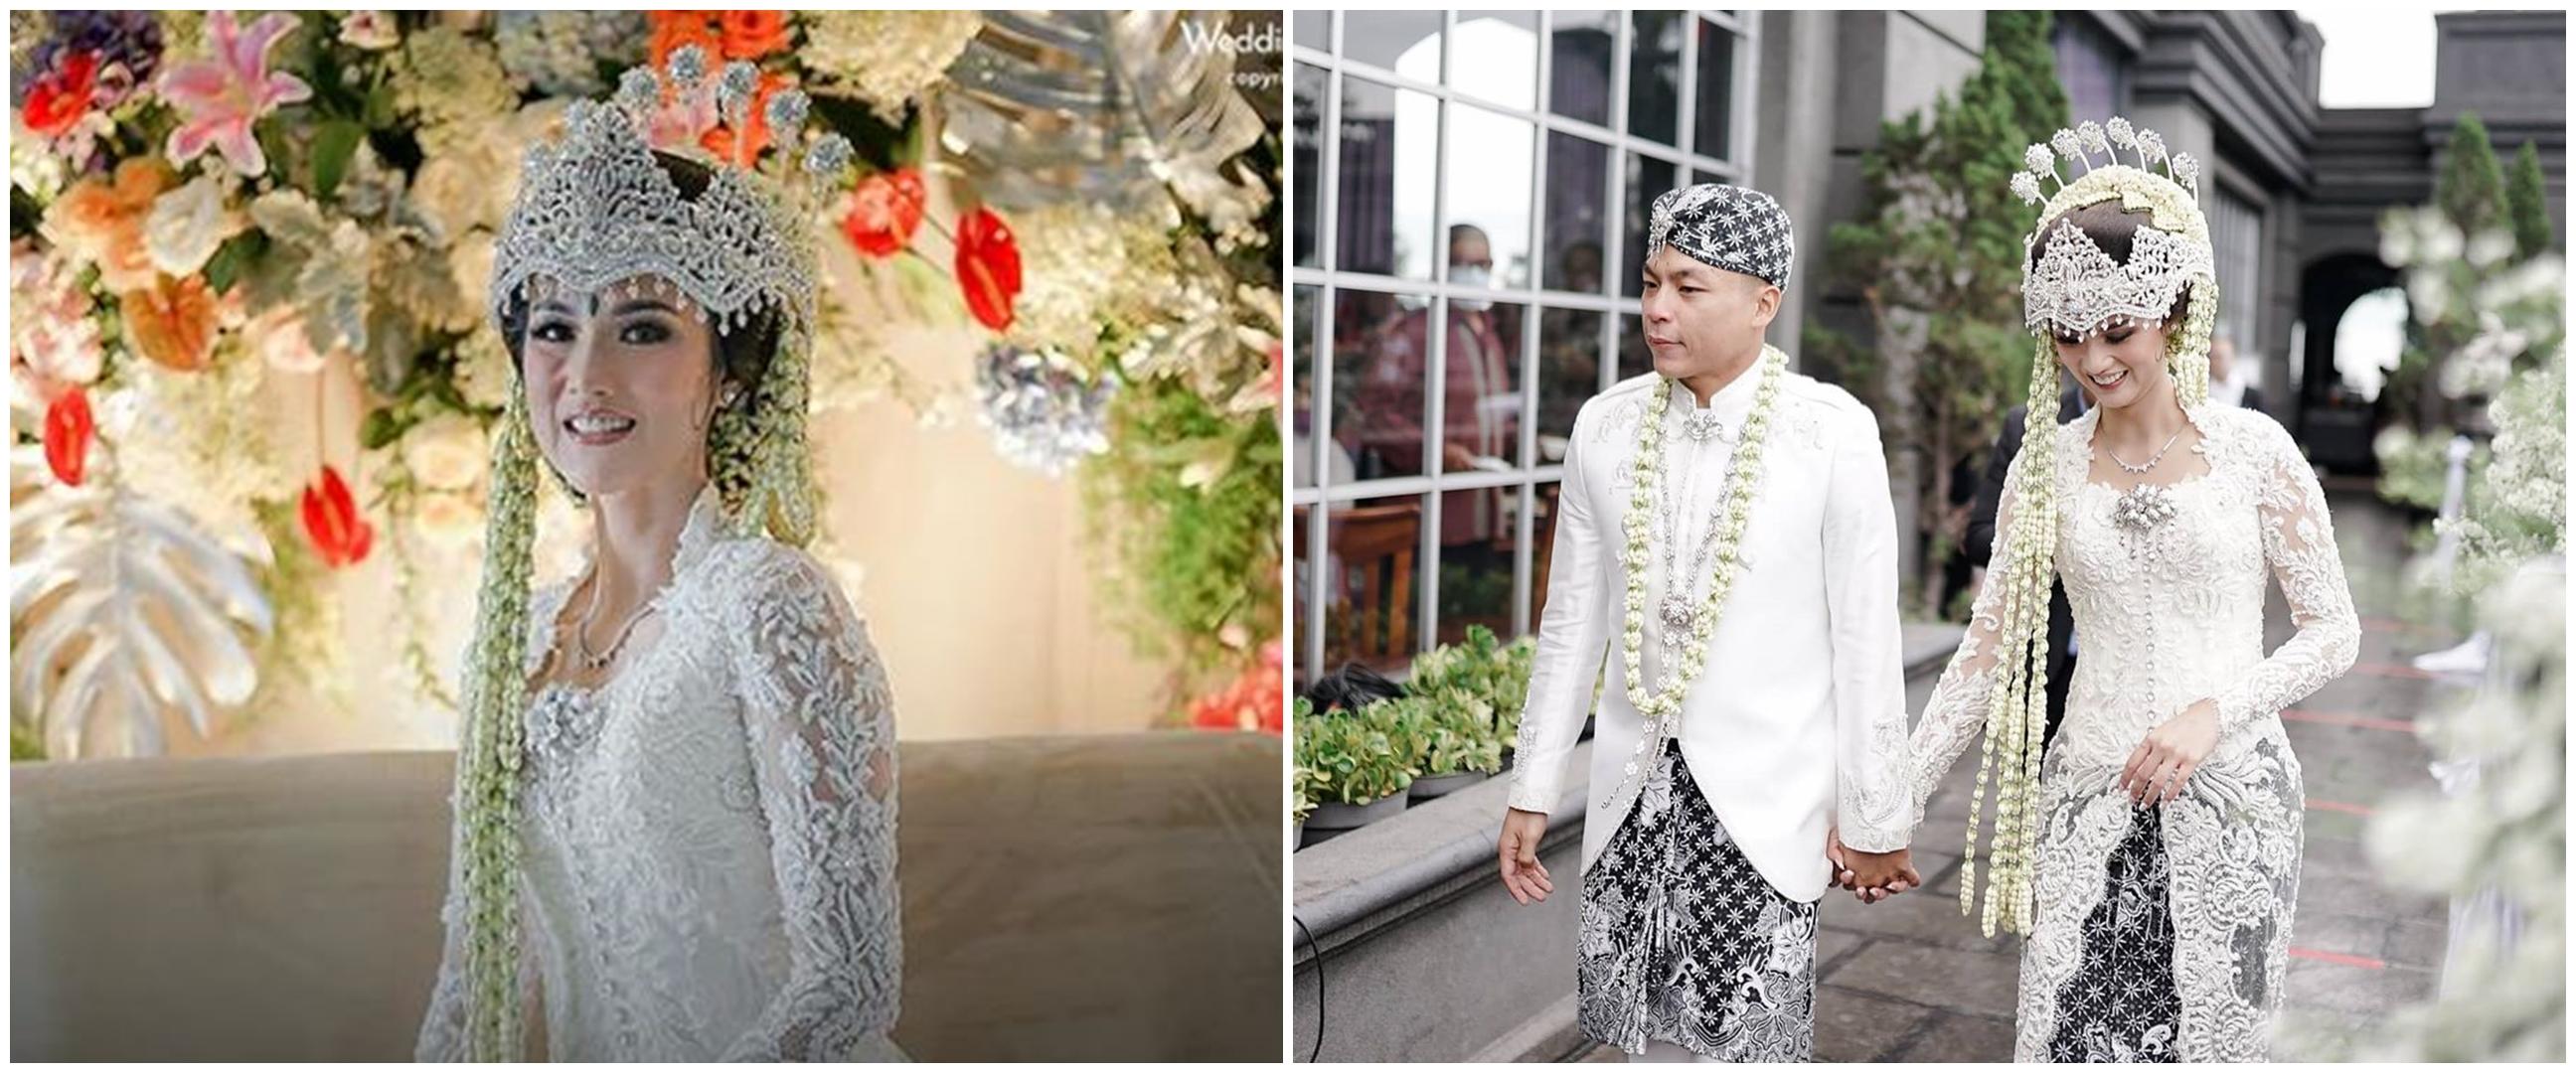 10 Momen pernikahan Atries Angel mantan Chef Juna, pakai adat Sunda